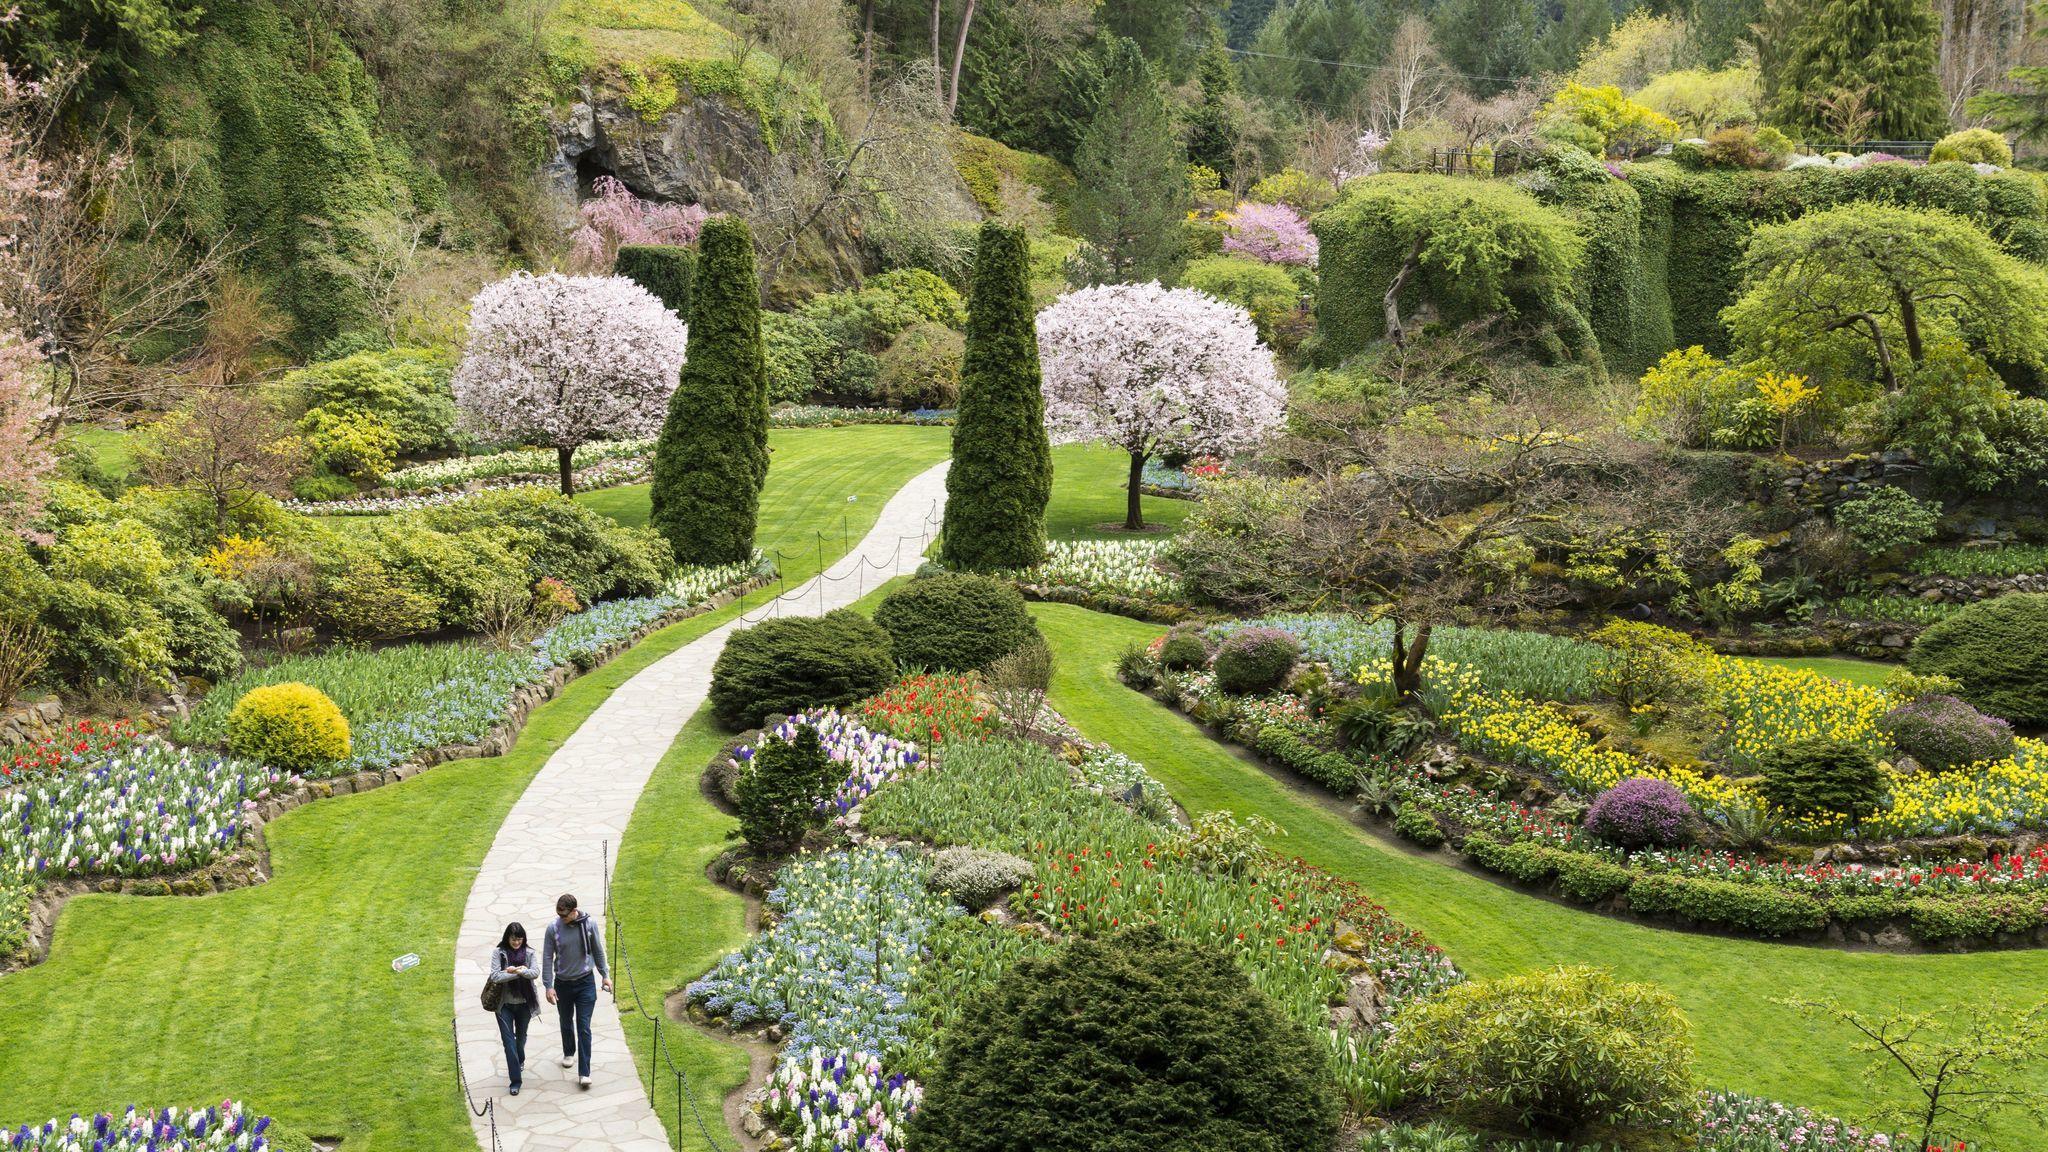 The Sunken Garden, Butchart Gardens, Brentwood Bay, Vancouver Island, British Columbia, Canada.